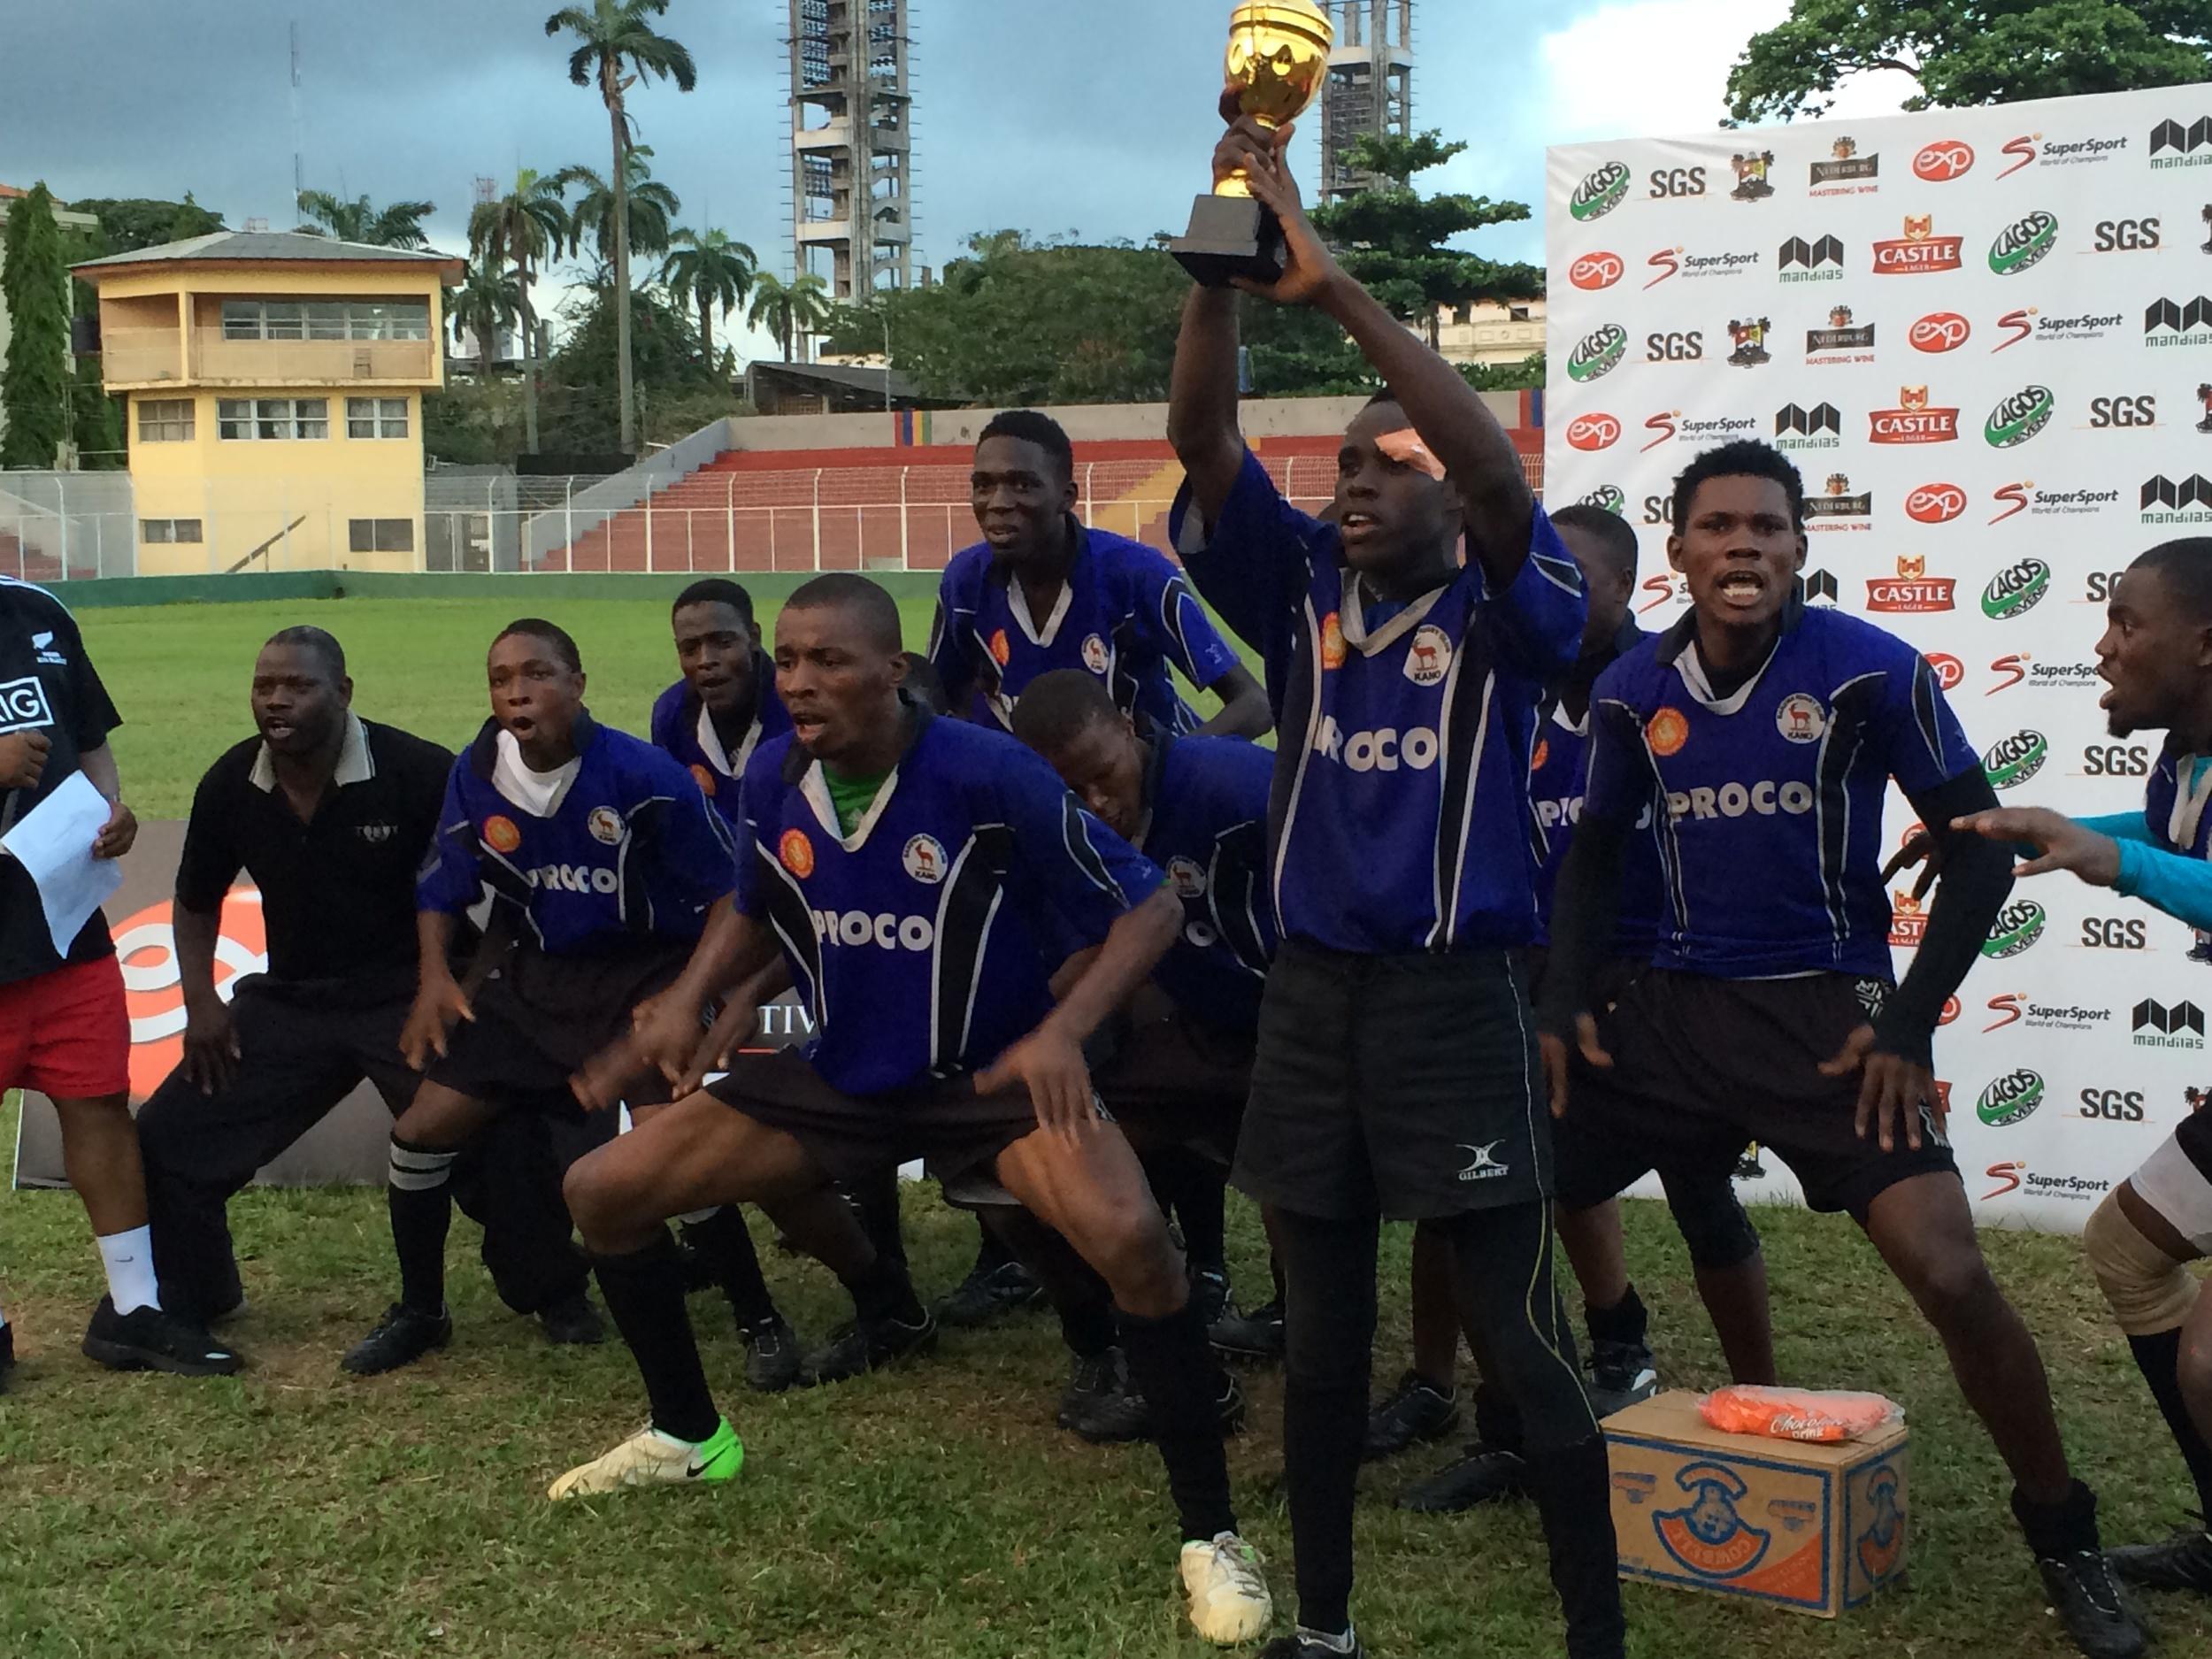 Champions Lagos 7s 2013